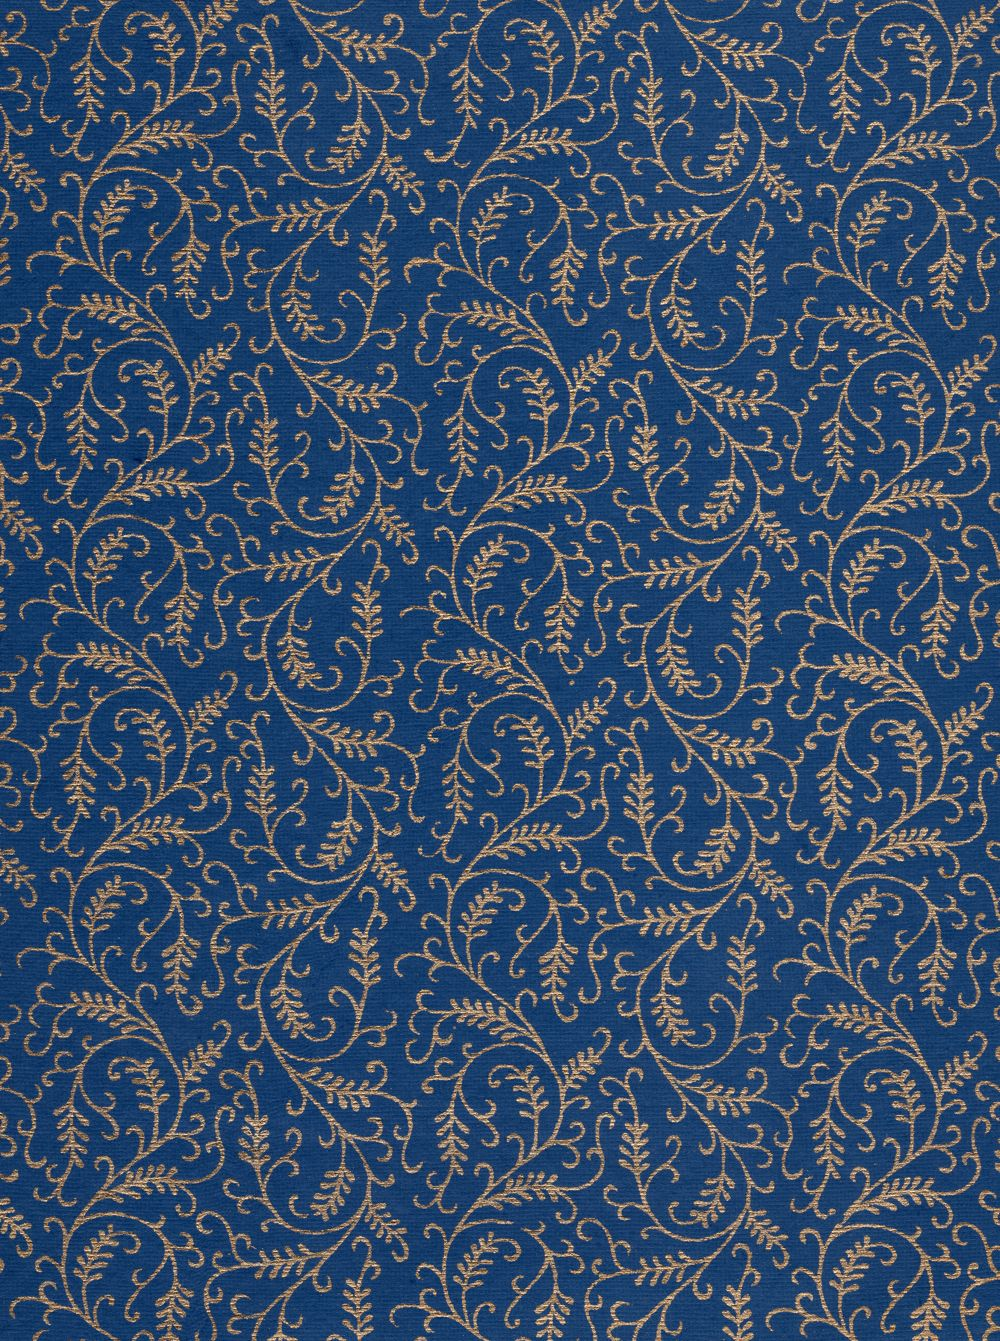 Free Paper Textures Blue paper texture, Paper texture